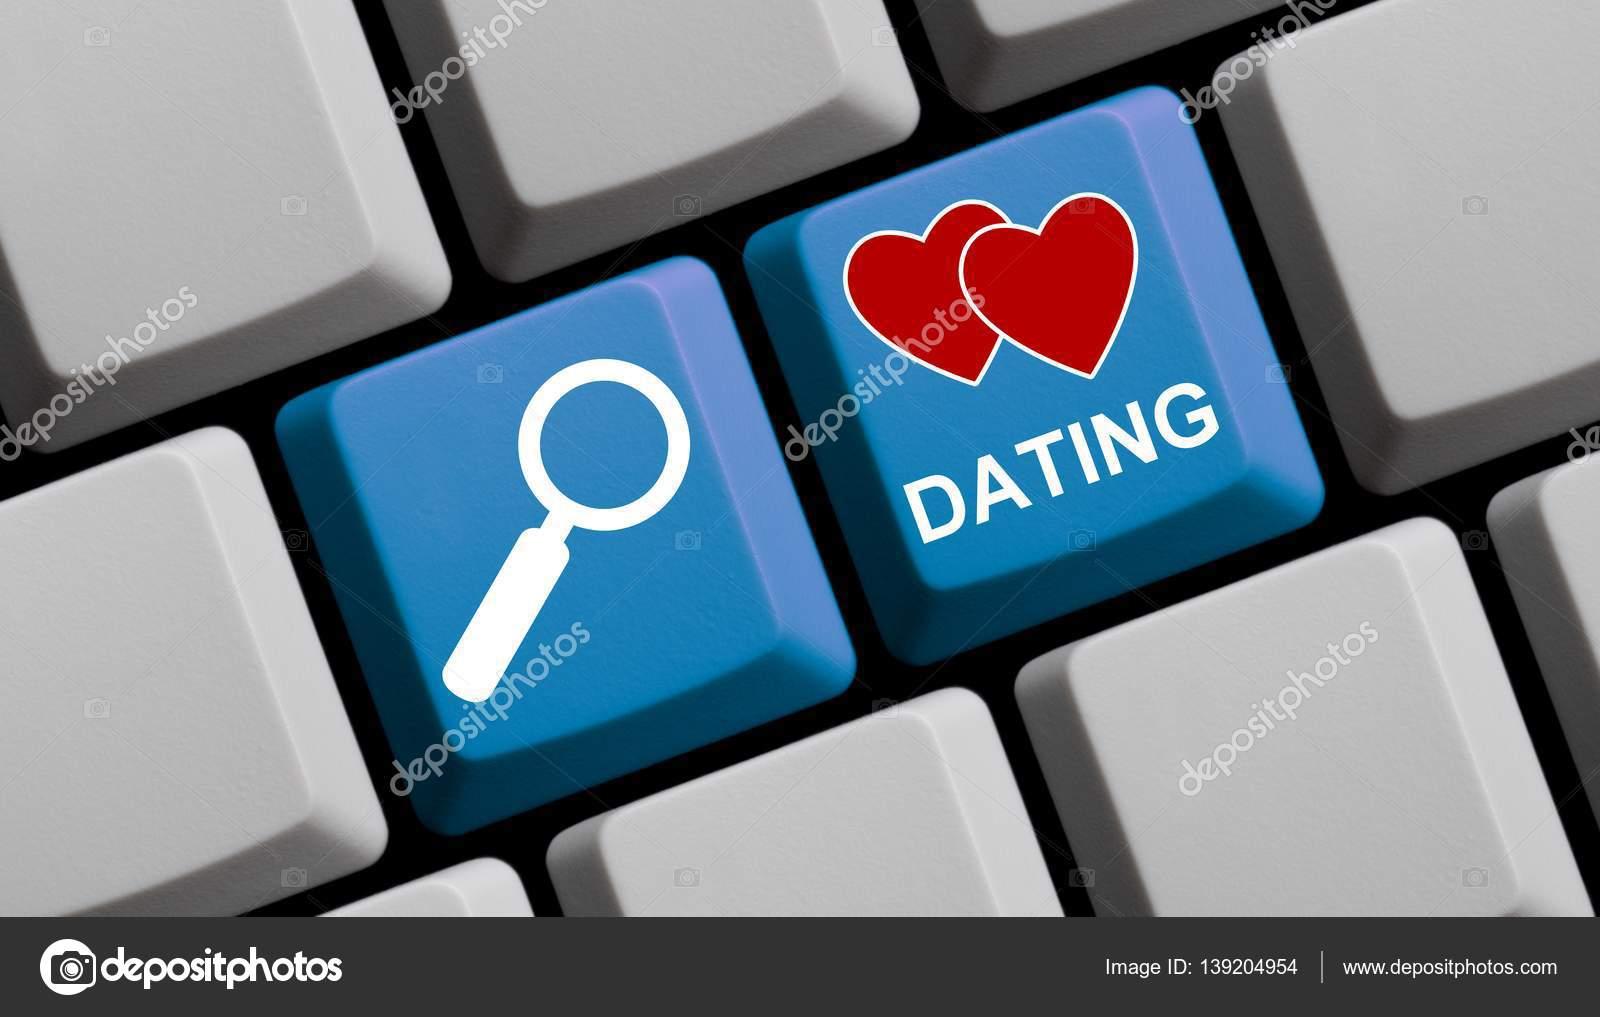 Dating σε απευθείας σύνδεση απάτες φωτογραφίες